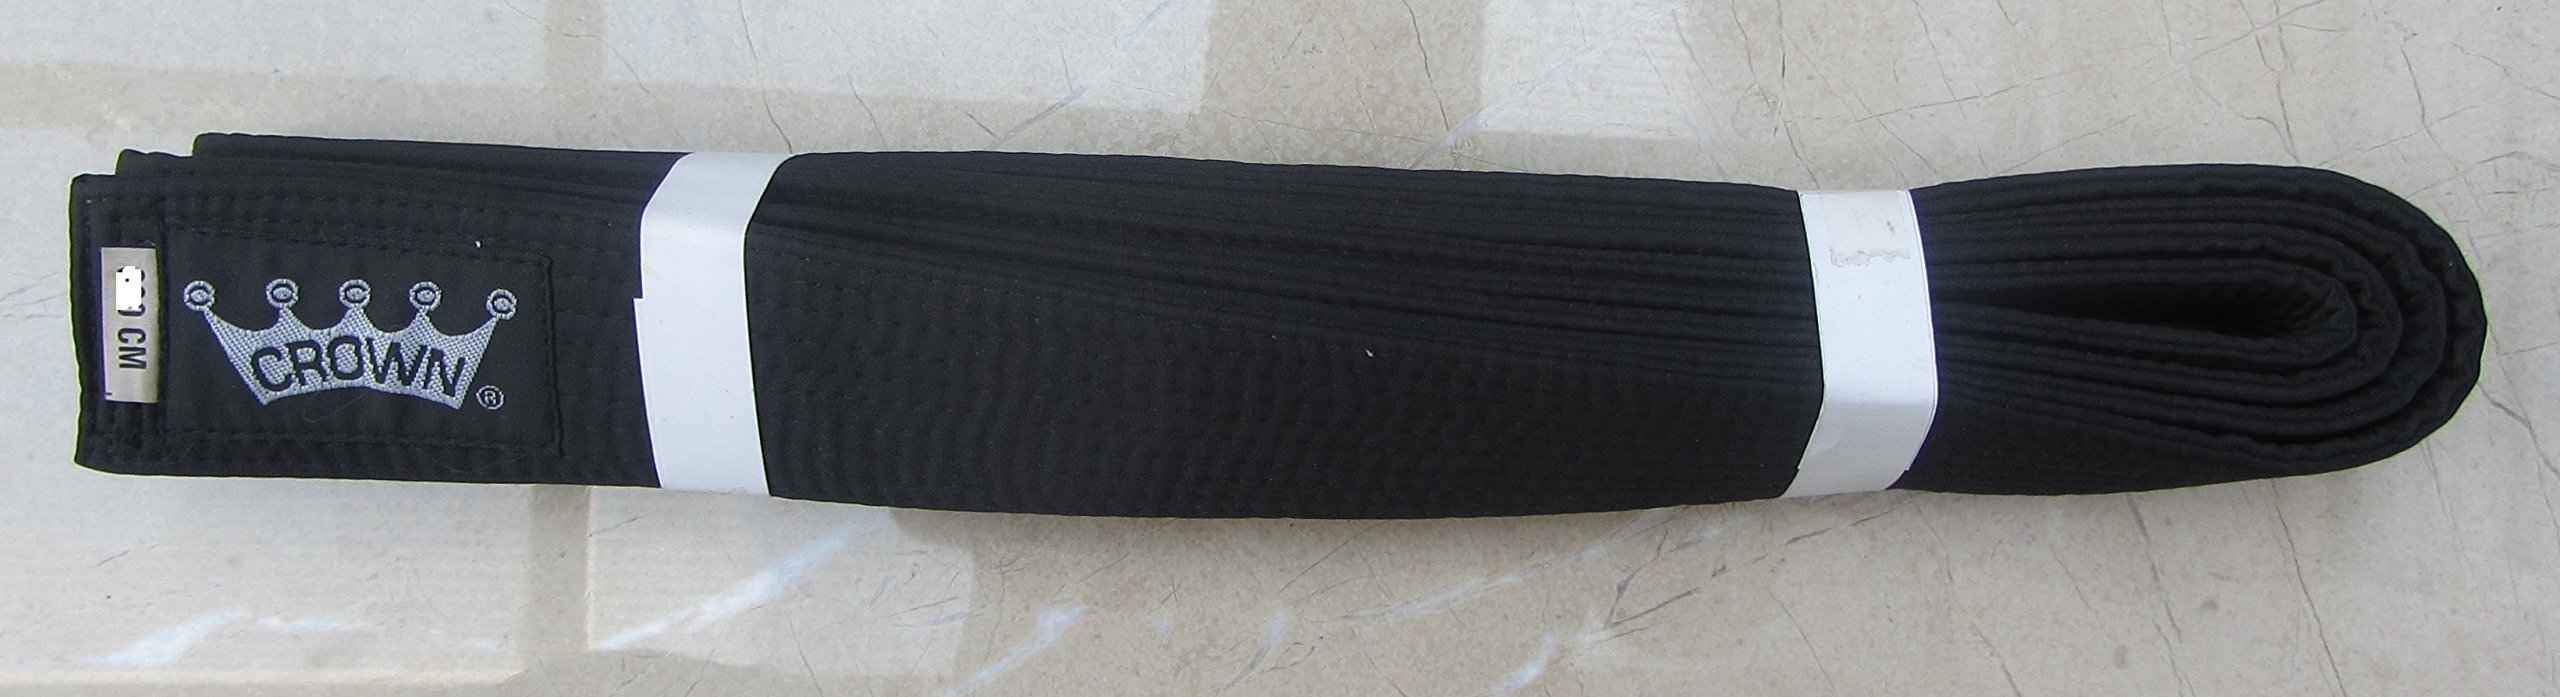 Black Belt -MASTER-Silk/Satin -280cm CROWN Martial Arts Kempo Kickboxing